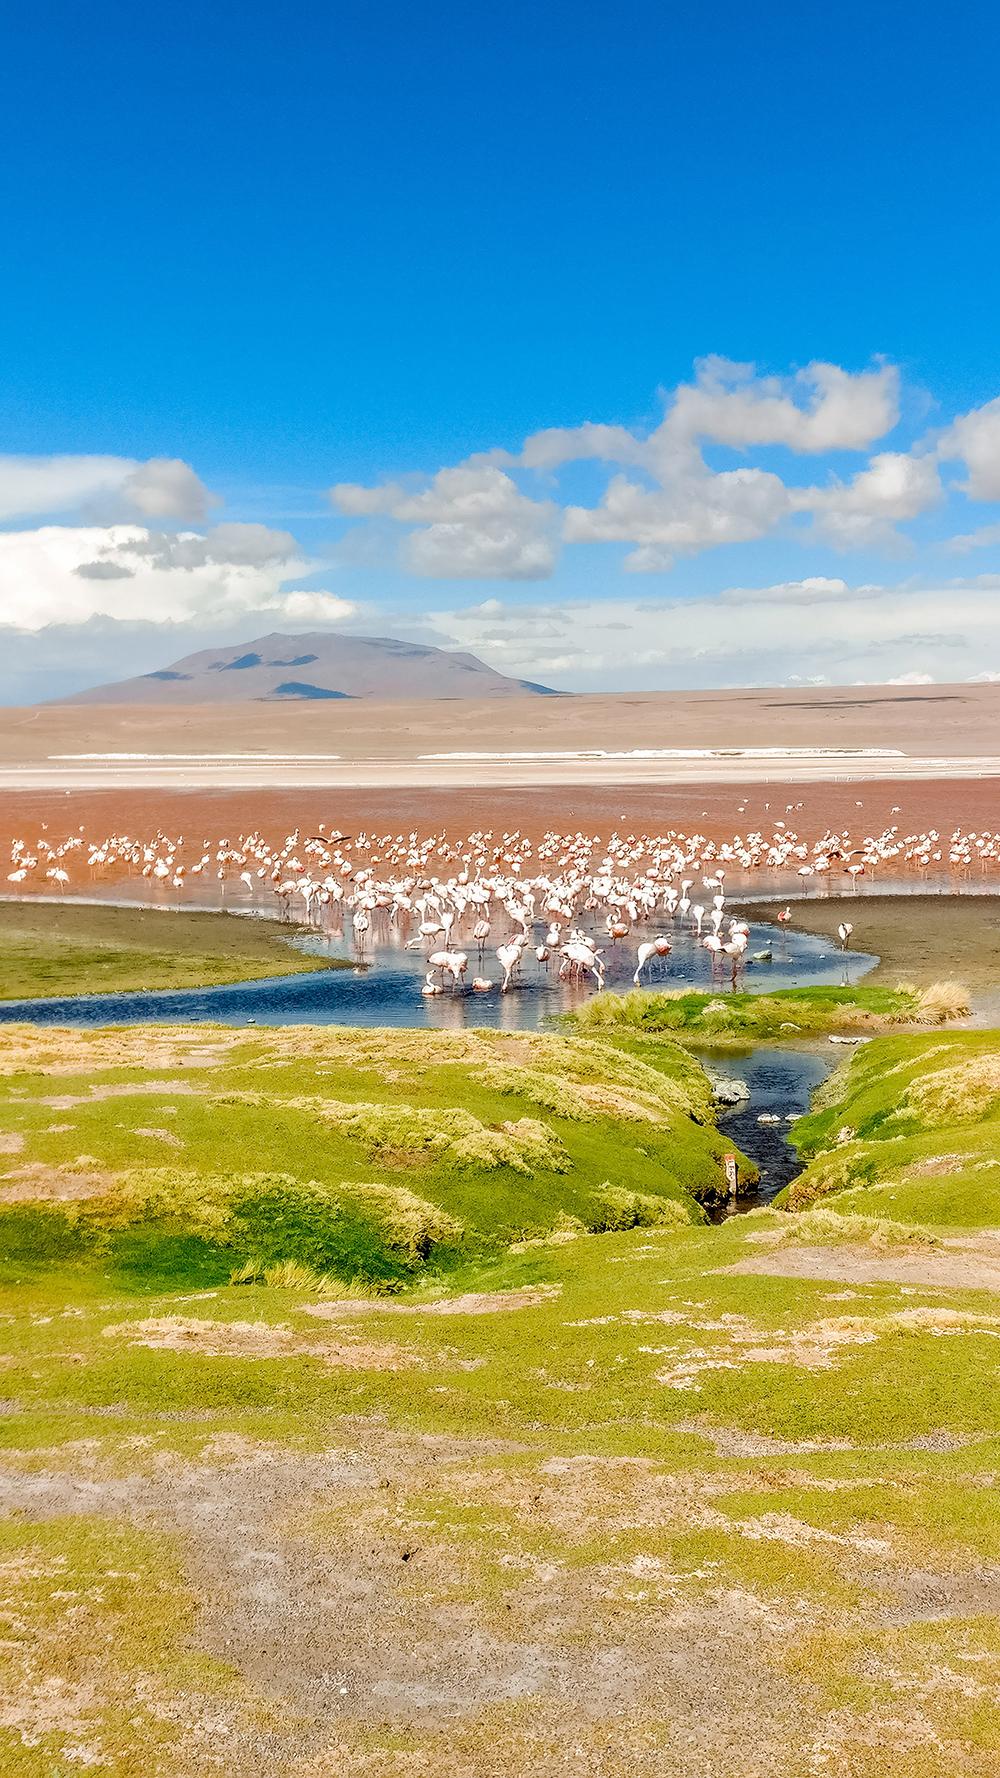 Laguna Colorada with llamas and flamingos - How to pick the best Uyuni Salt Flats tour to Bolivia? | Aliz's Wonderland